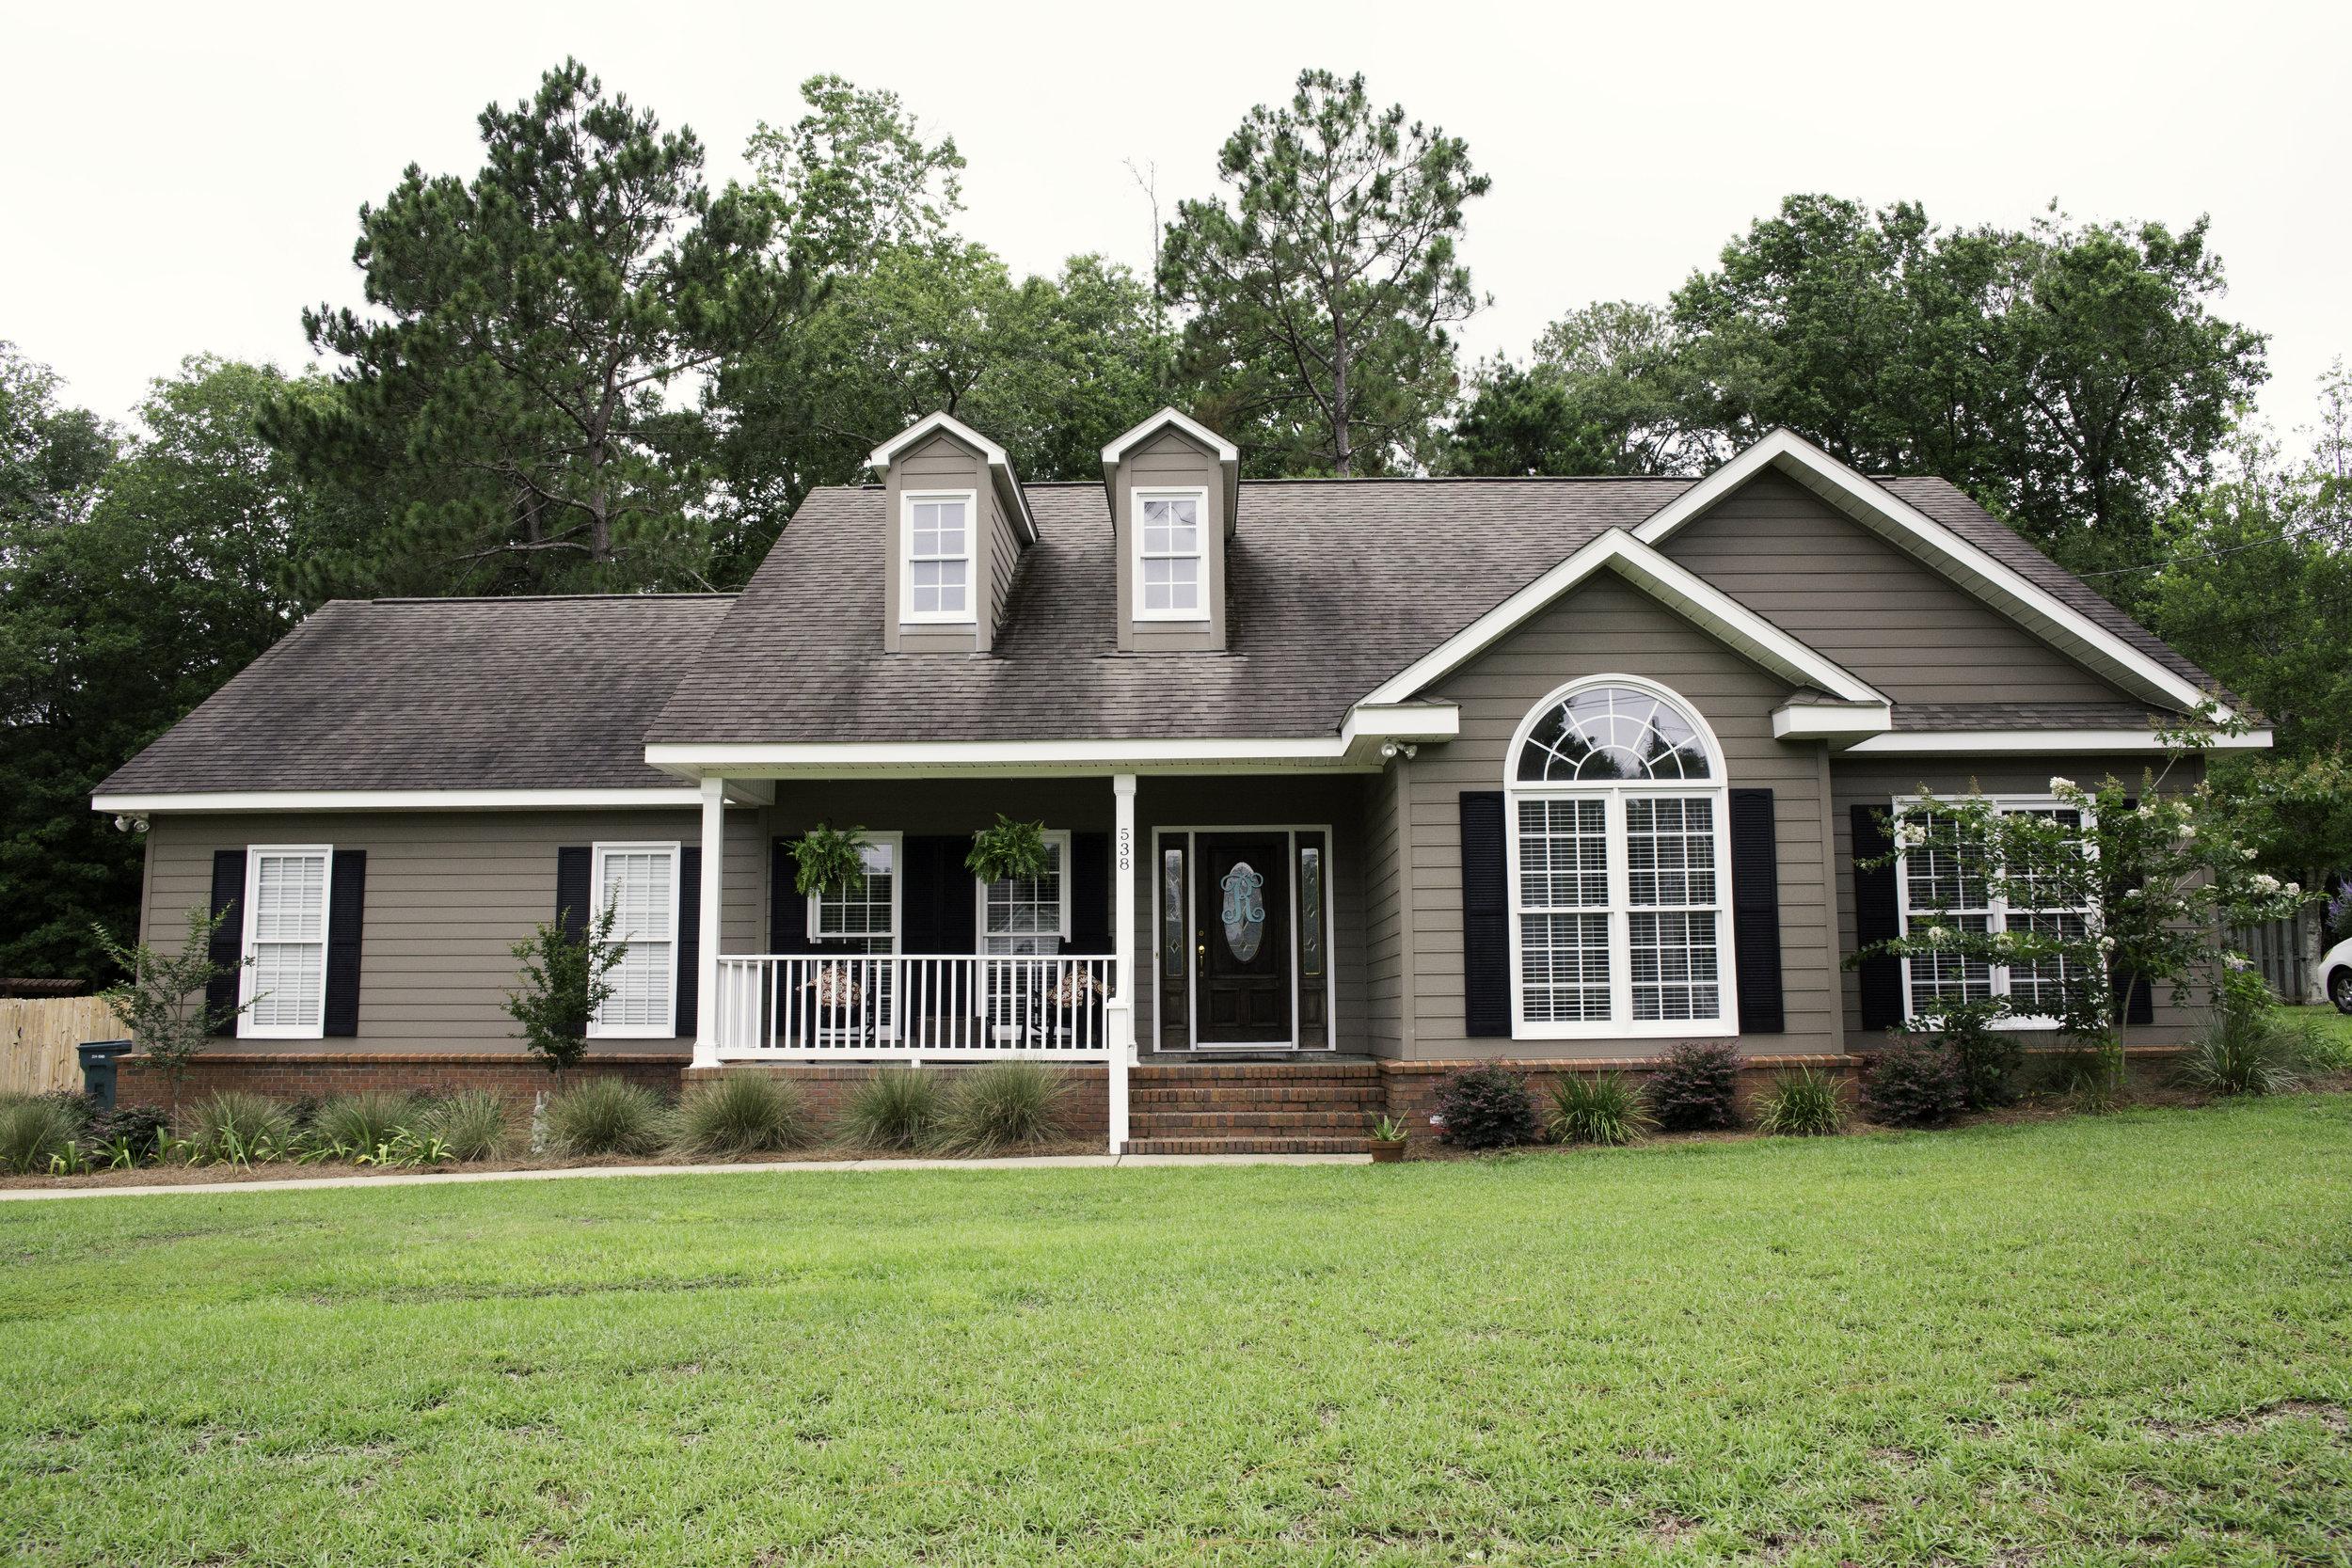 home-for-sale-in-middleton-id-111016-hero.jpg